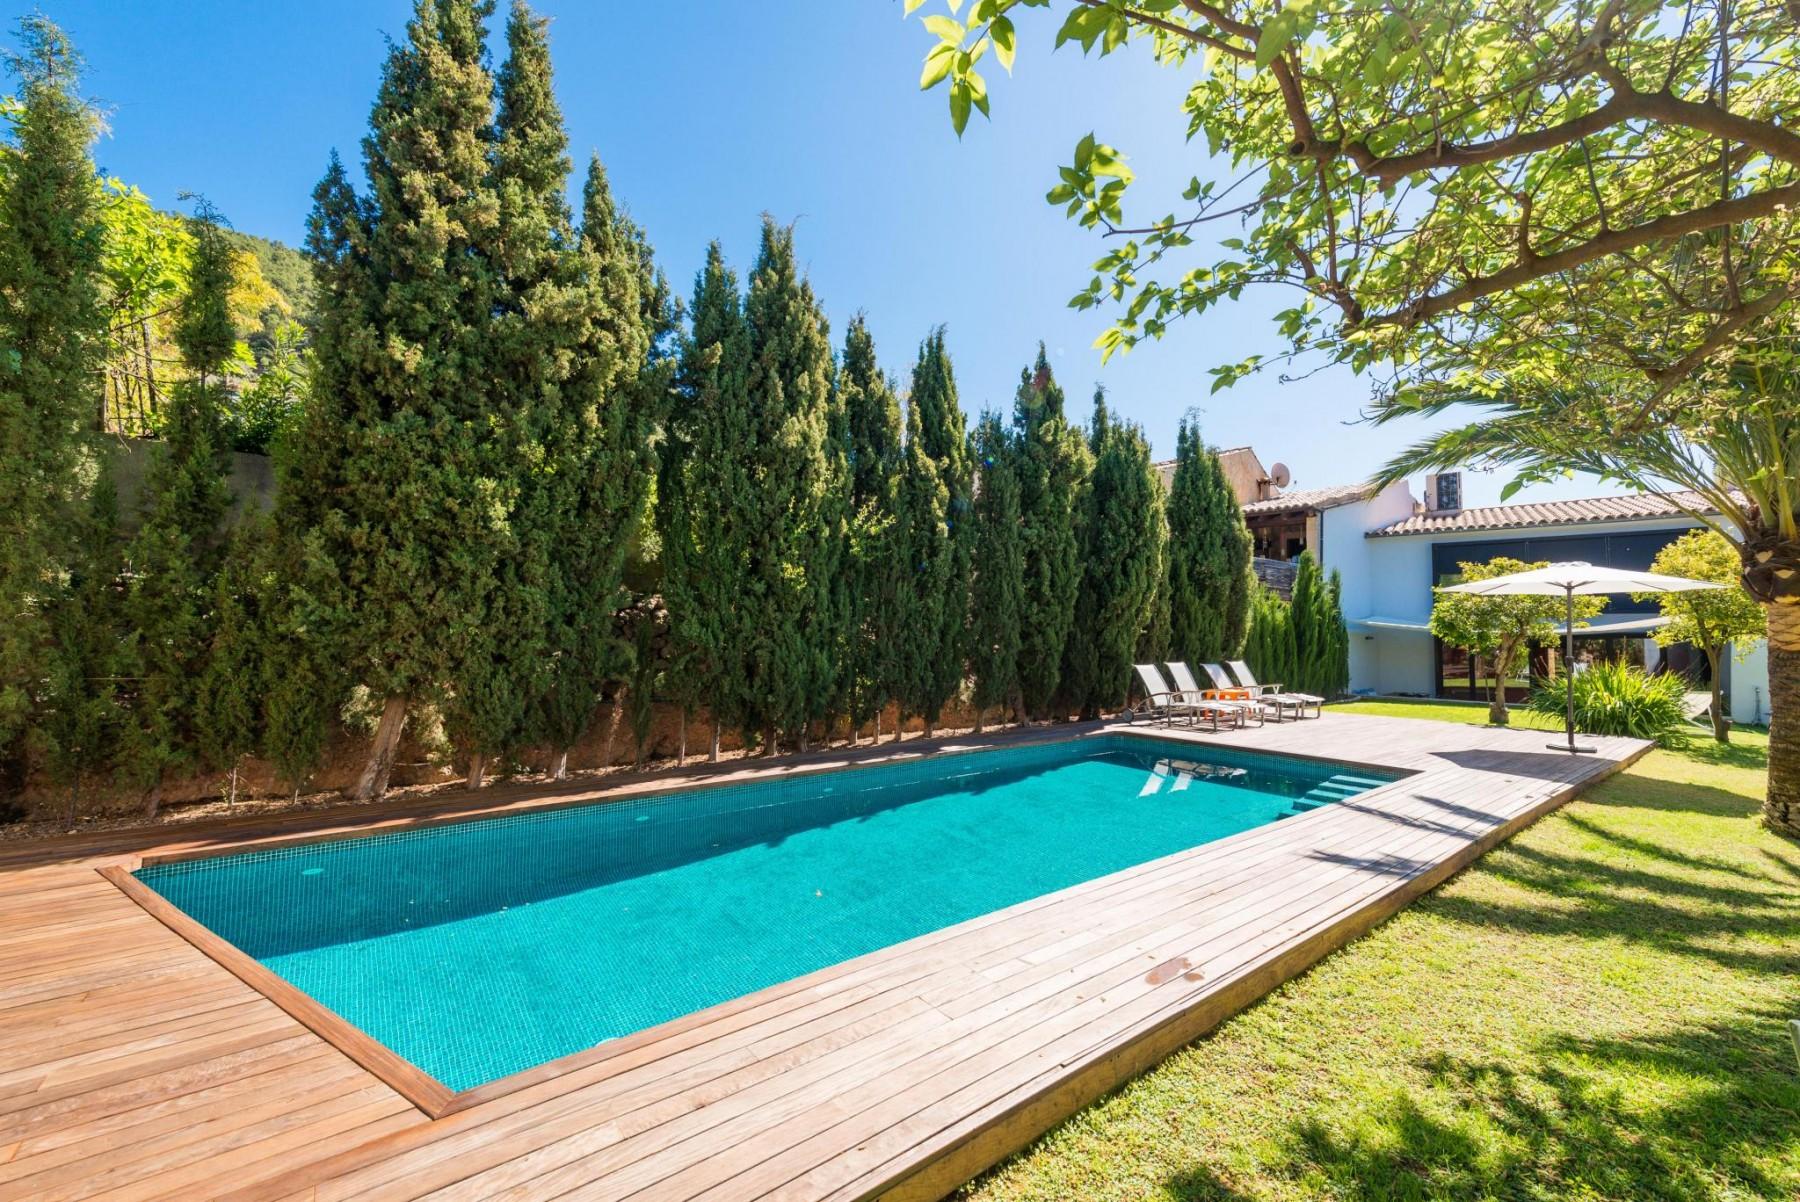 CA'N CABRIT for 6 guests in Alaro, Spanien